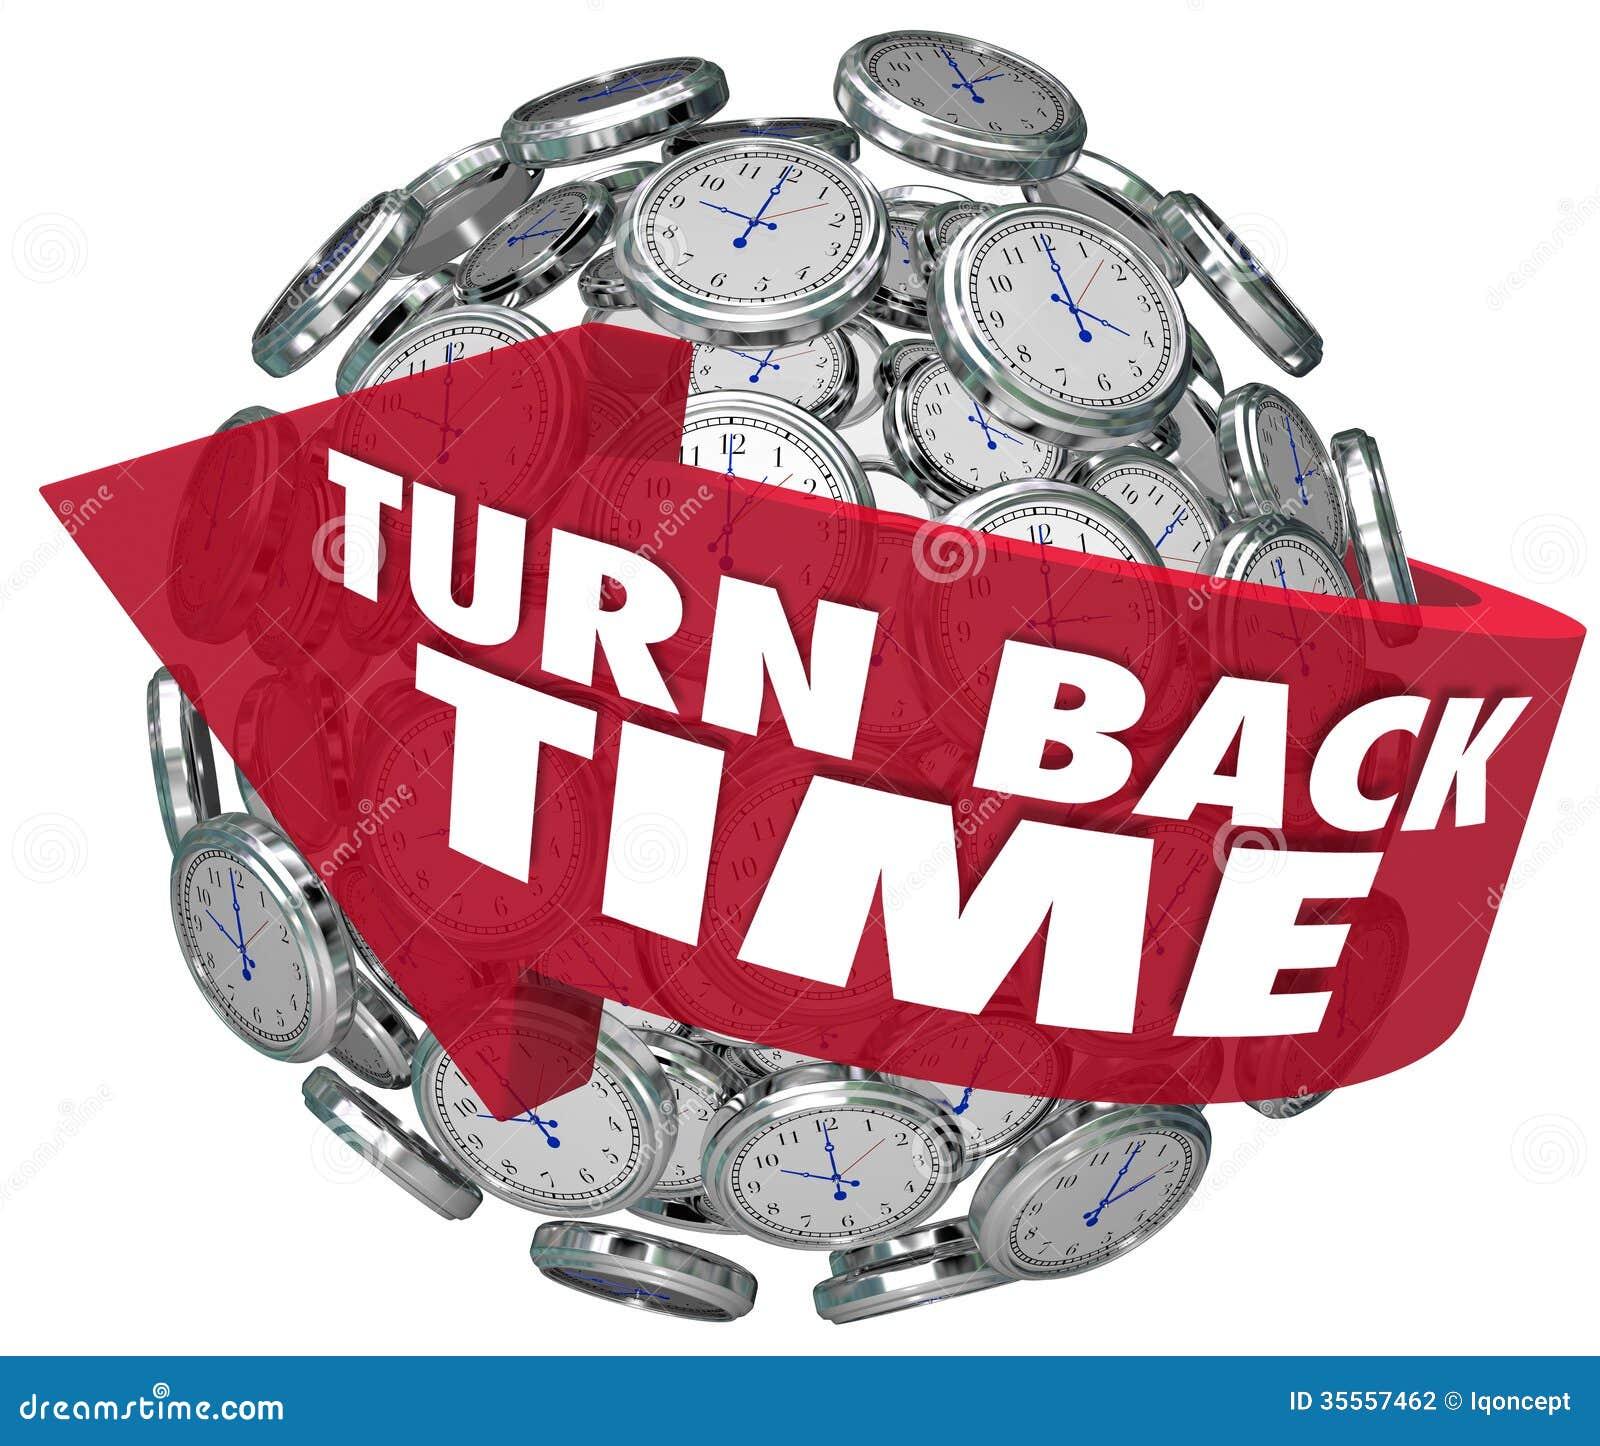 Turn Back Clock Stock Illustrations 293 Turn Back Clock Stock Illustrations Vectors Clipart Dreamstime